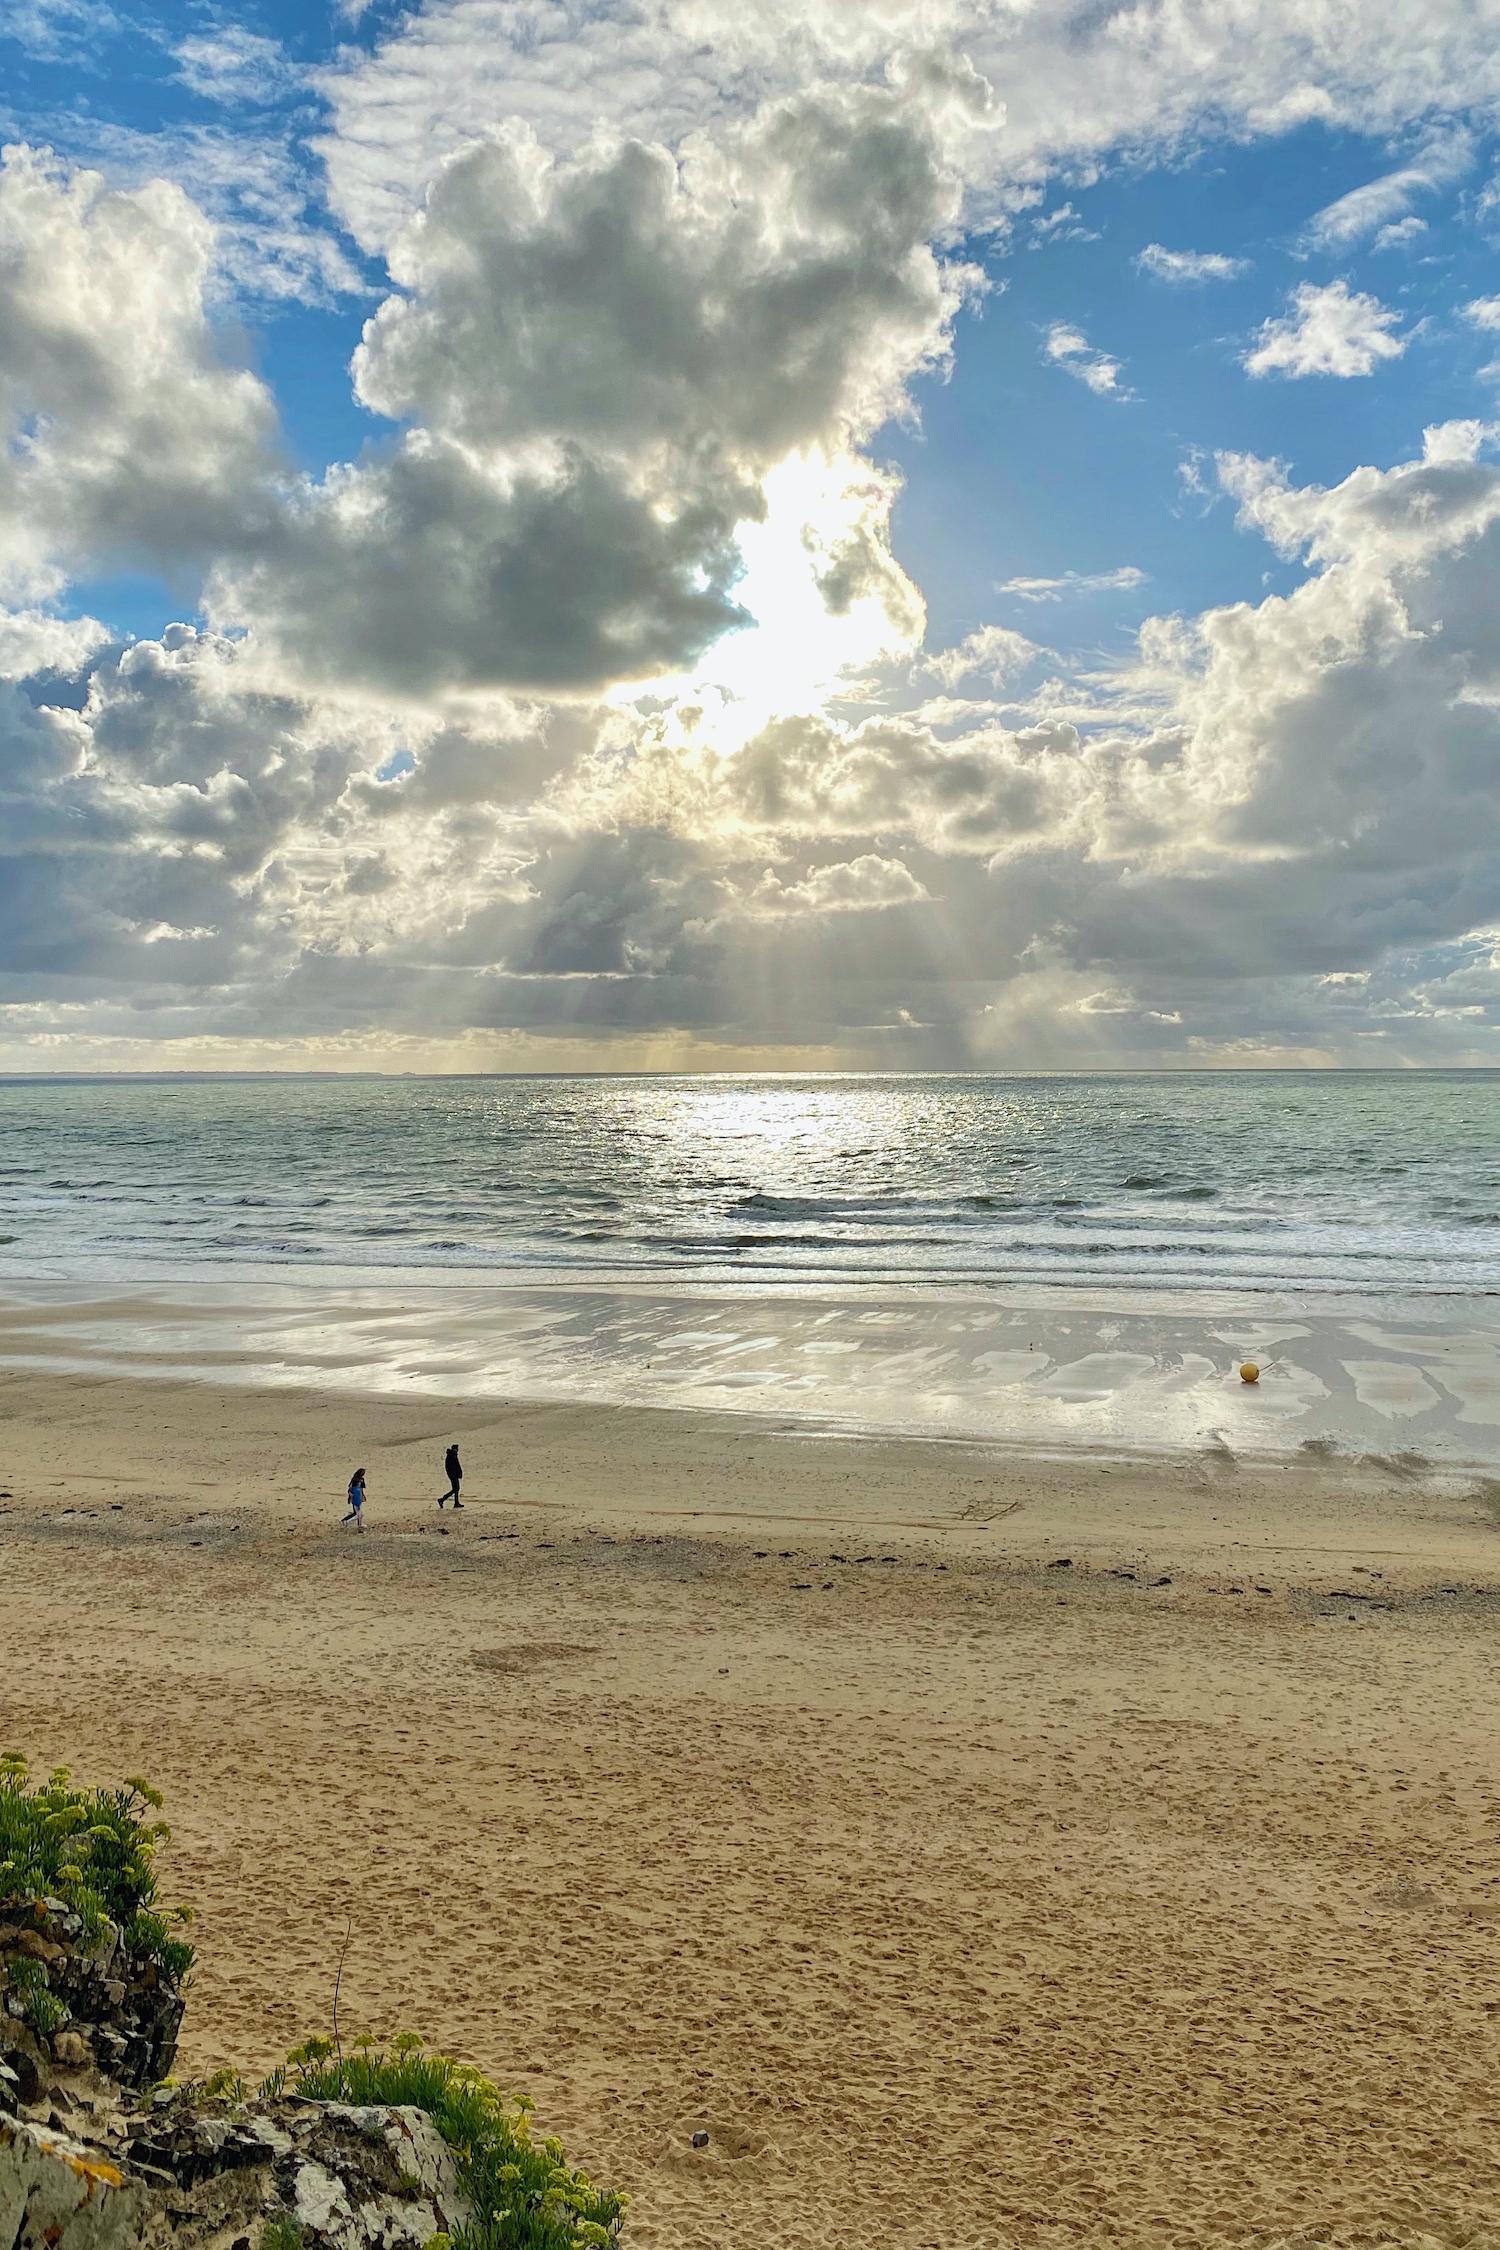 Still in Normandy Carolles beach